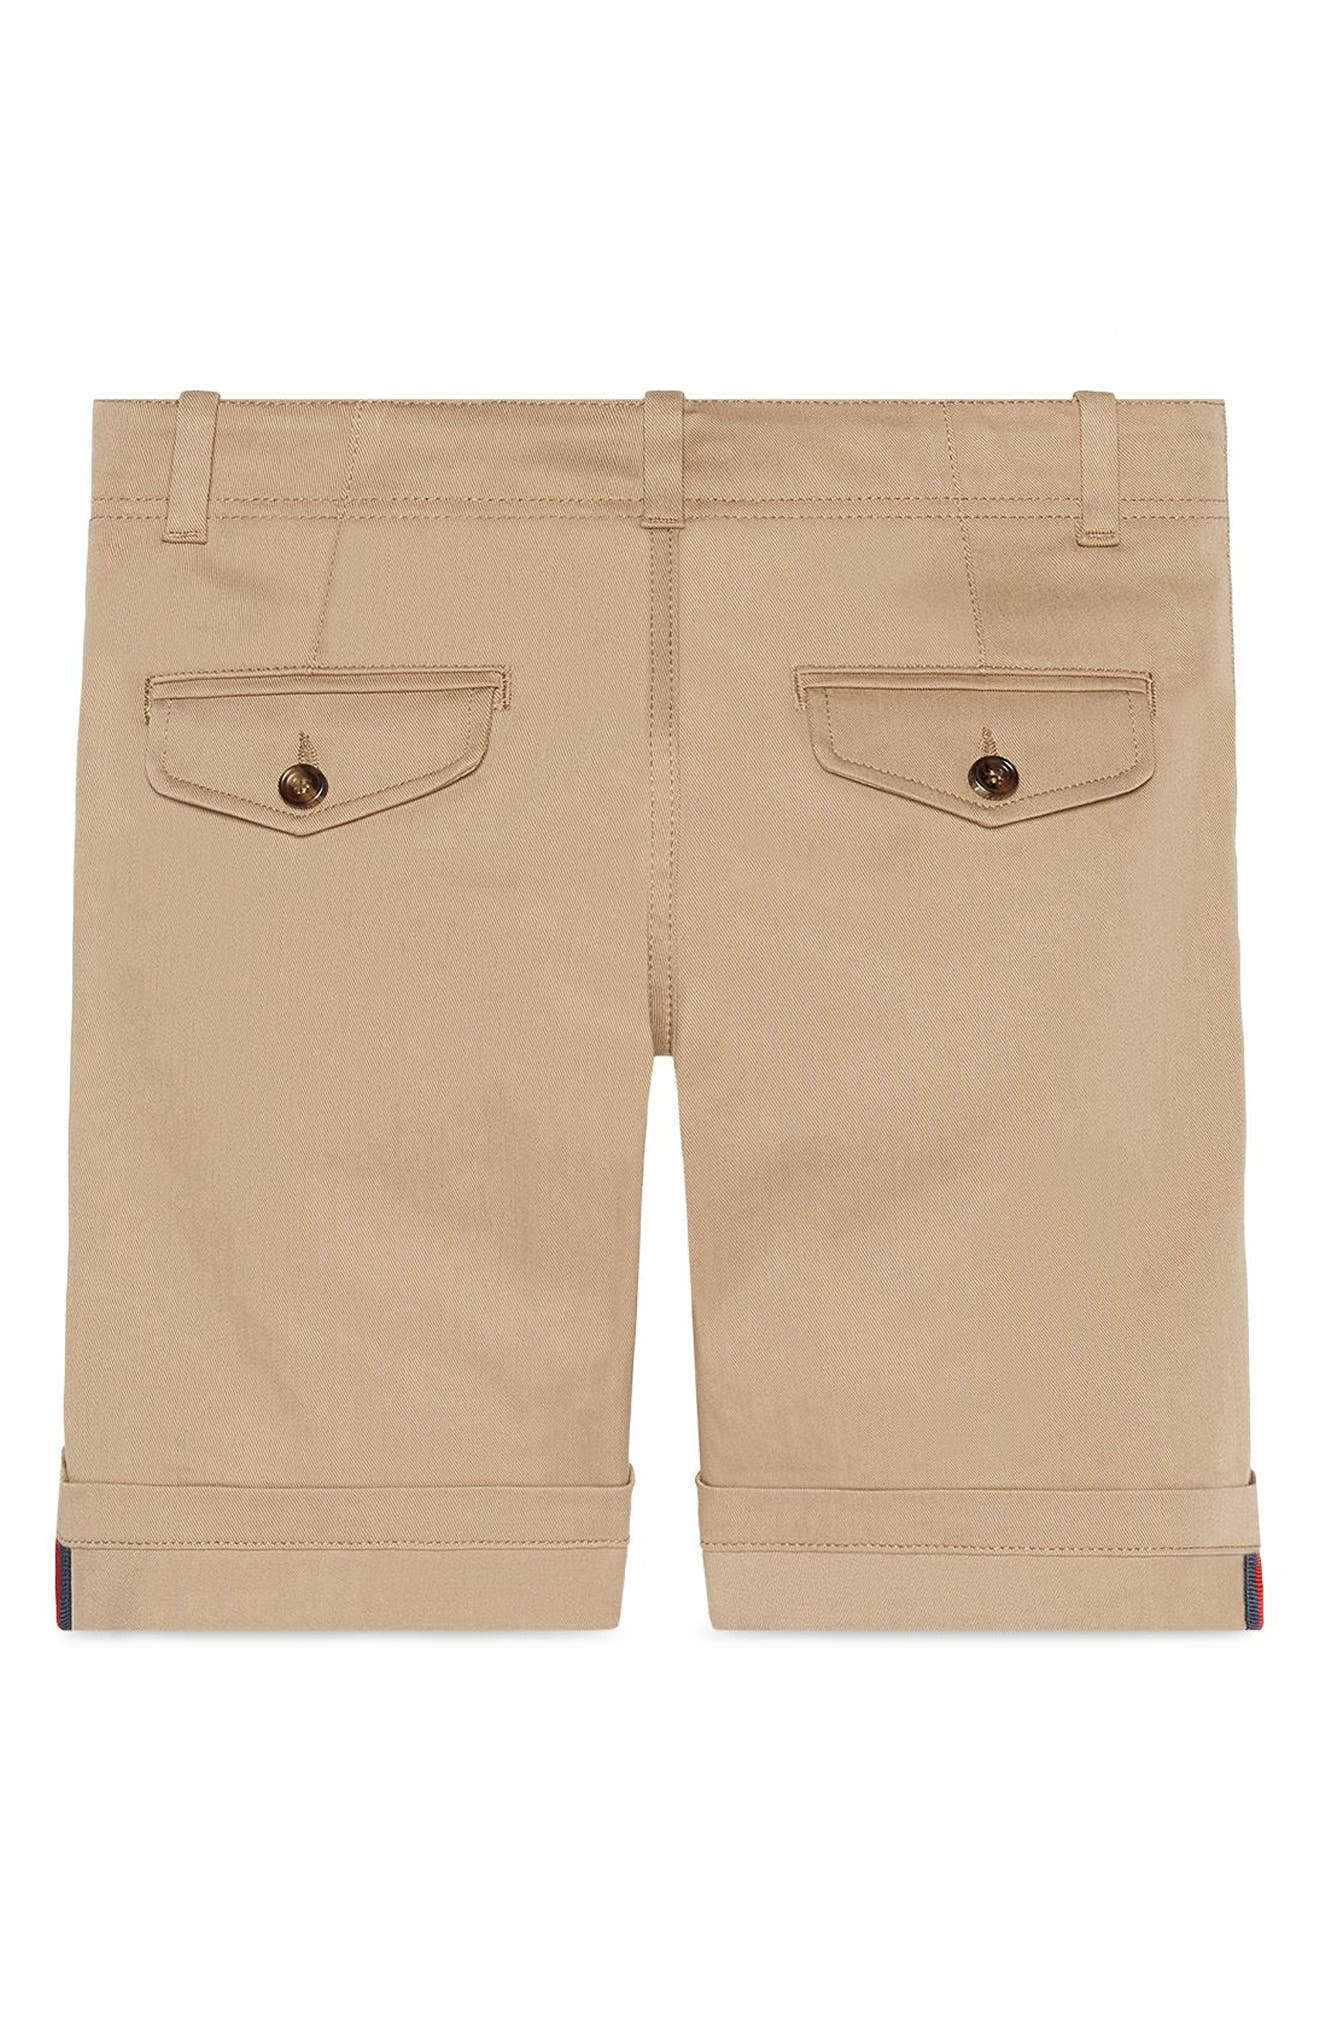 GUCCI,                             Stretch Cotton Shorts,                             Alternate thumbnail 2, color,                             BEIGE